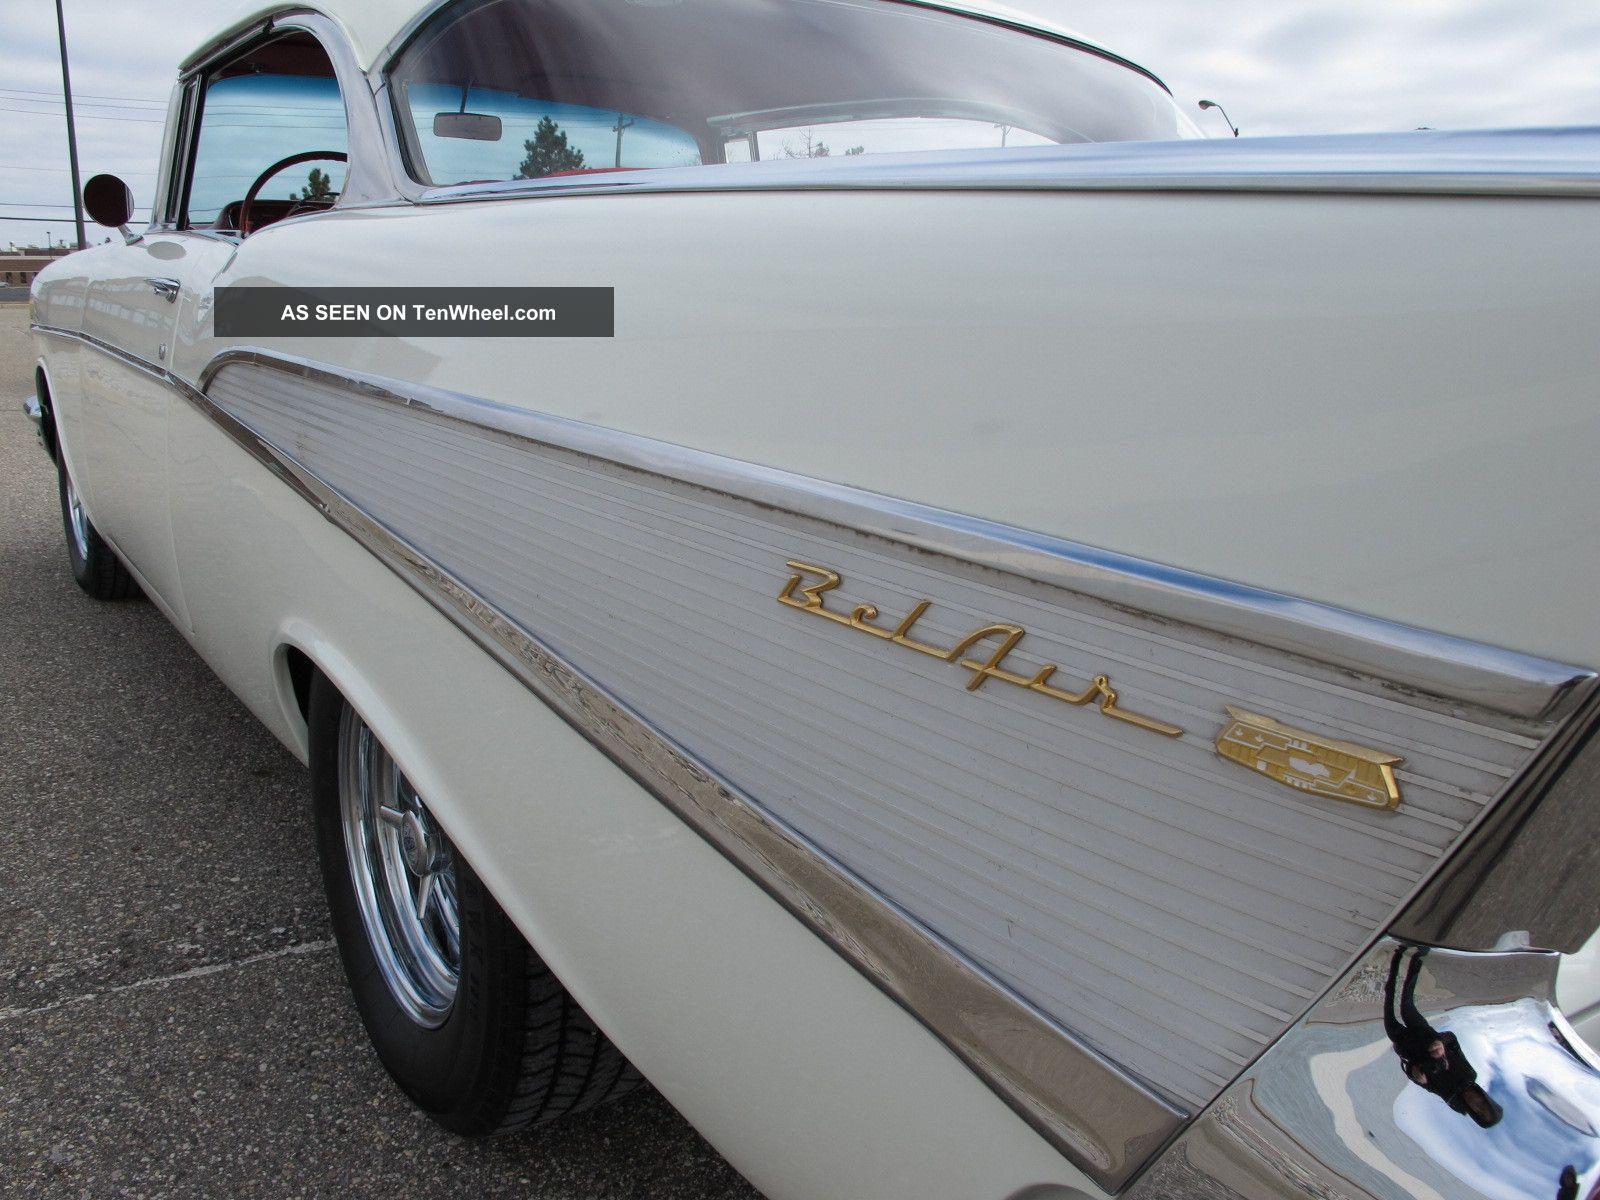 1957 Bel Air Hardtop Excellent Turn Key Driver Paint Color Chevy Convertible Colors